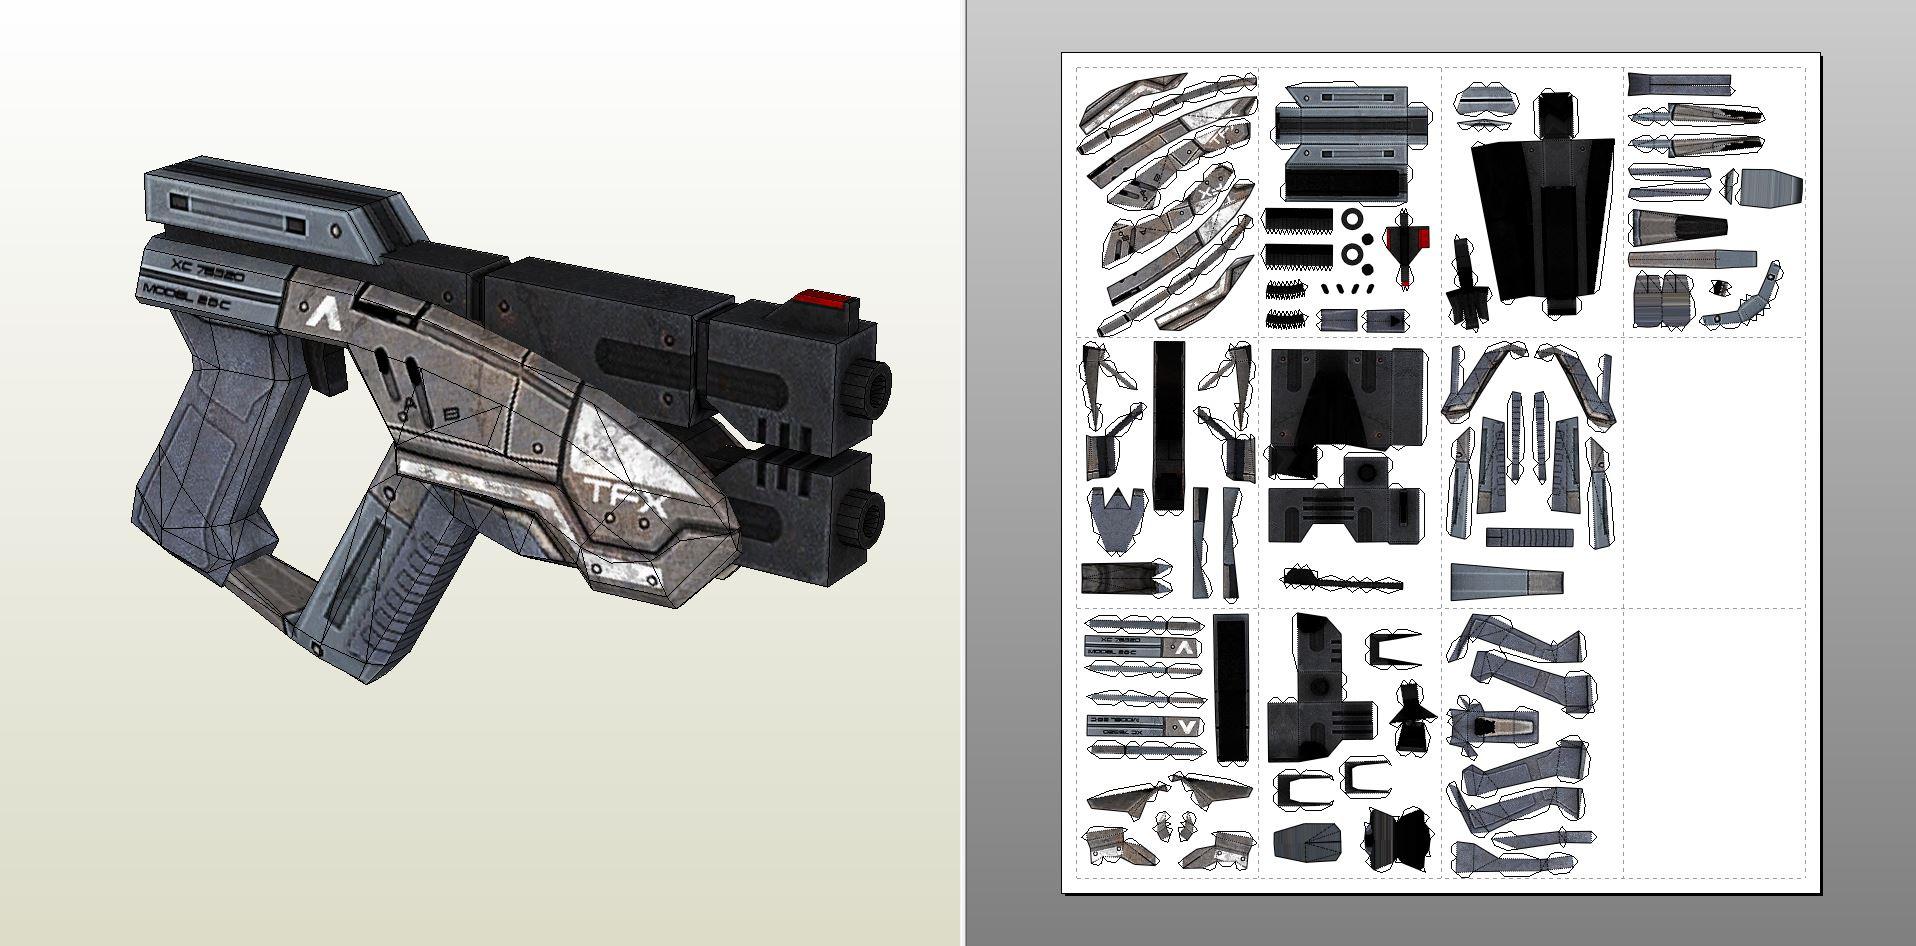 Papercraft pdo file template for predator m3 pistol predatorm3pistol pronofoot35fo Gallery